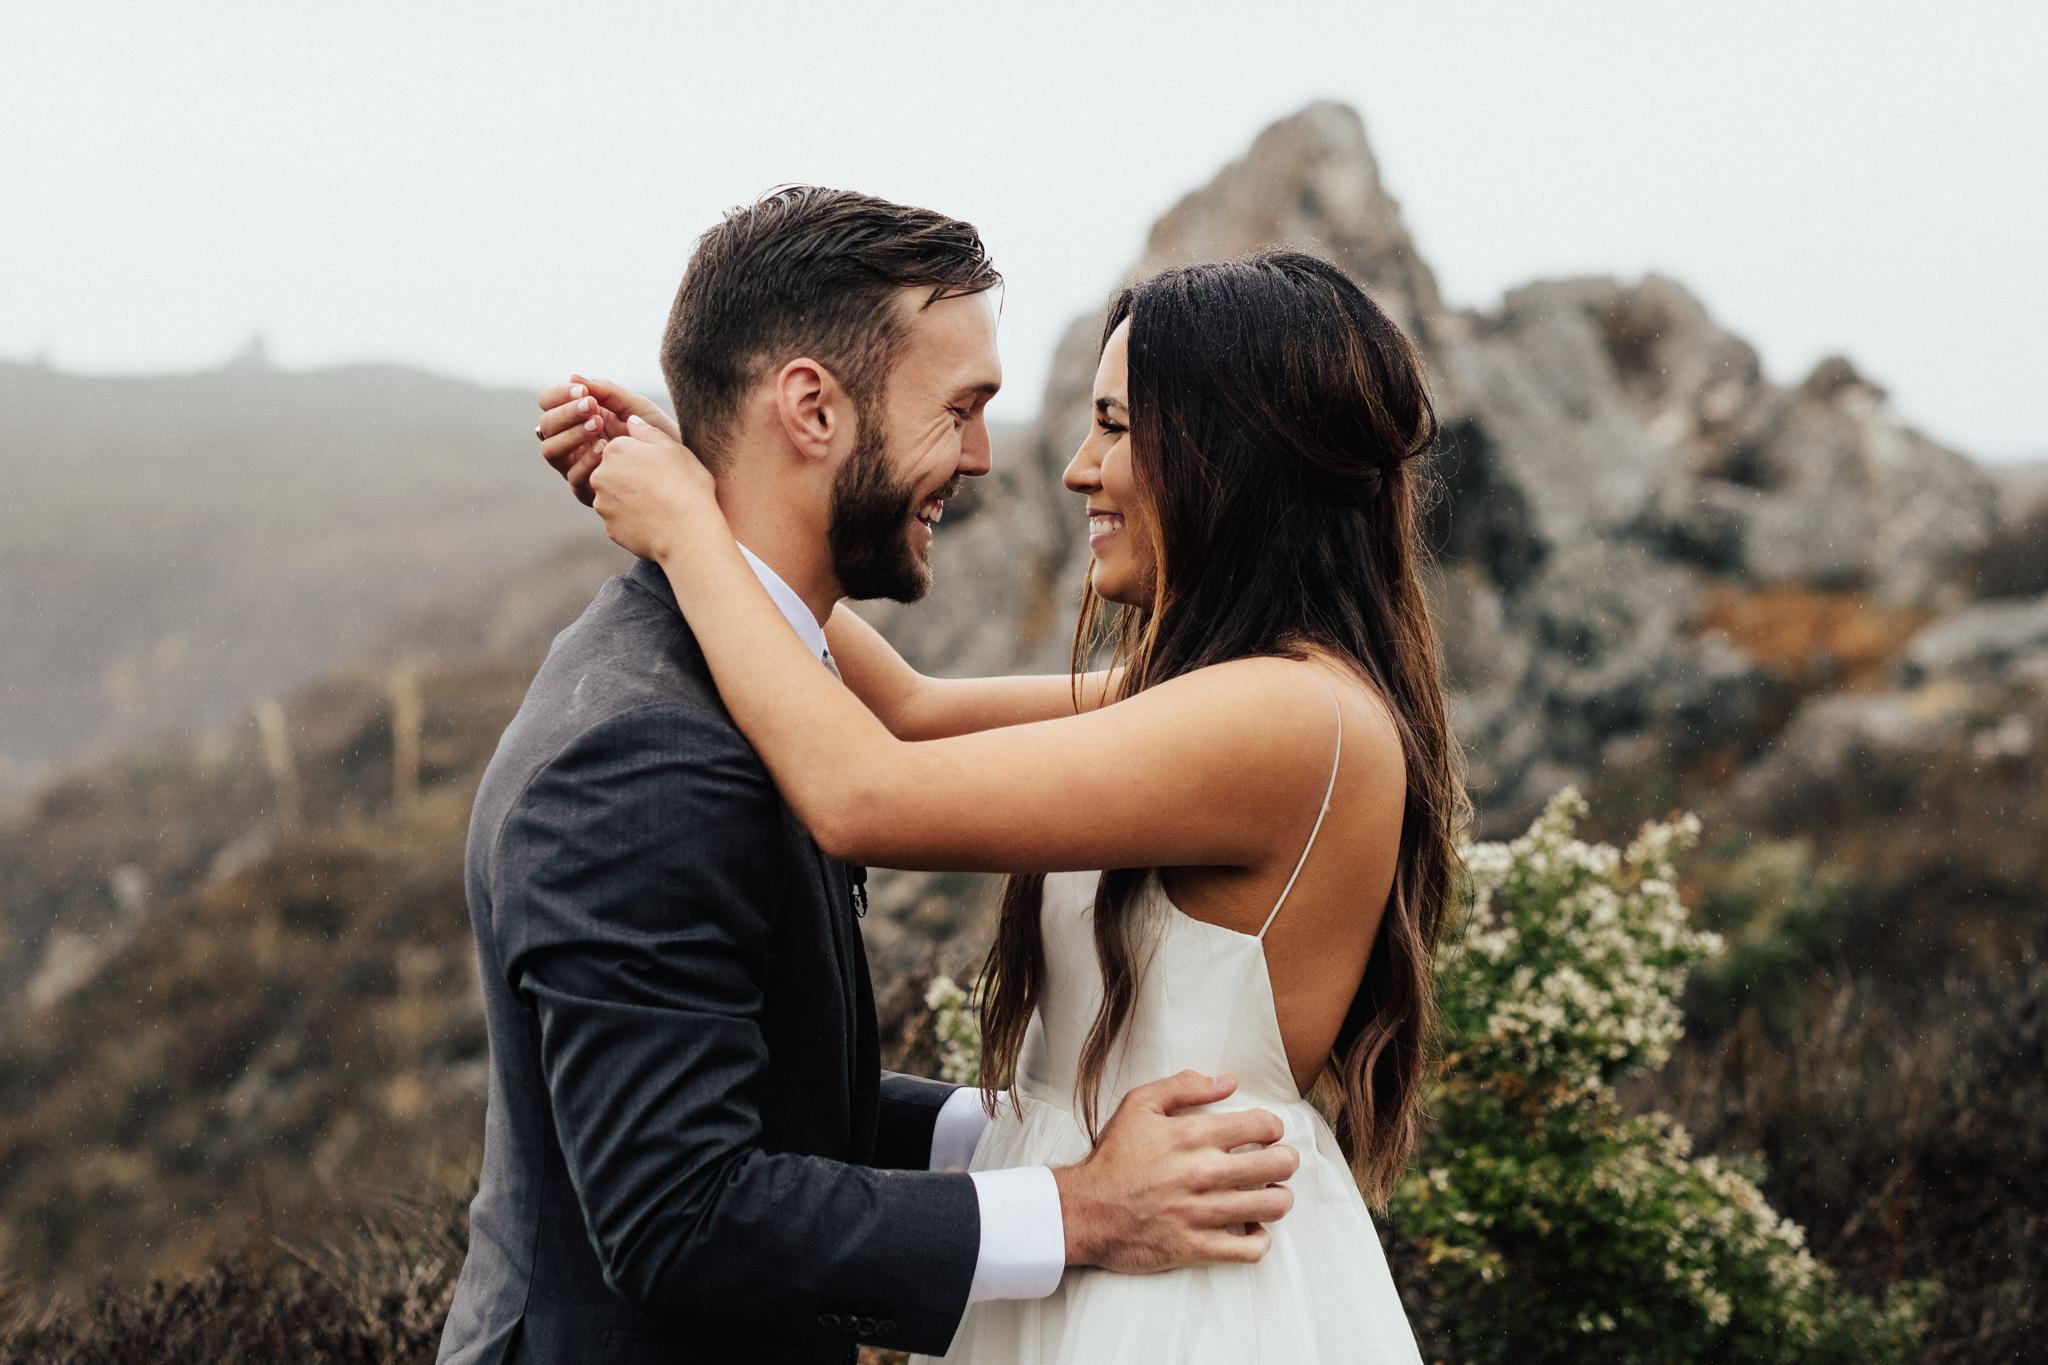 Arizona-Adventure-Elopement-Wedding-Photographer-1.jpg